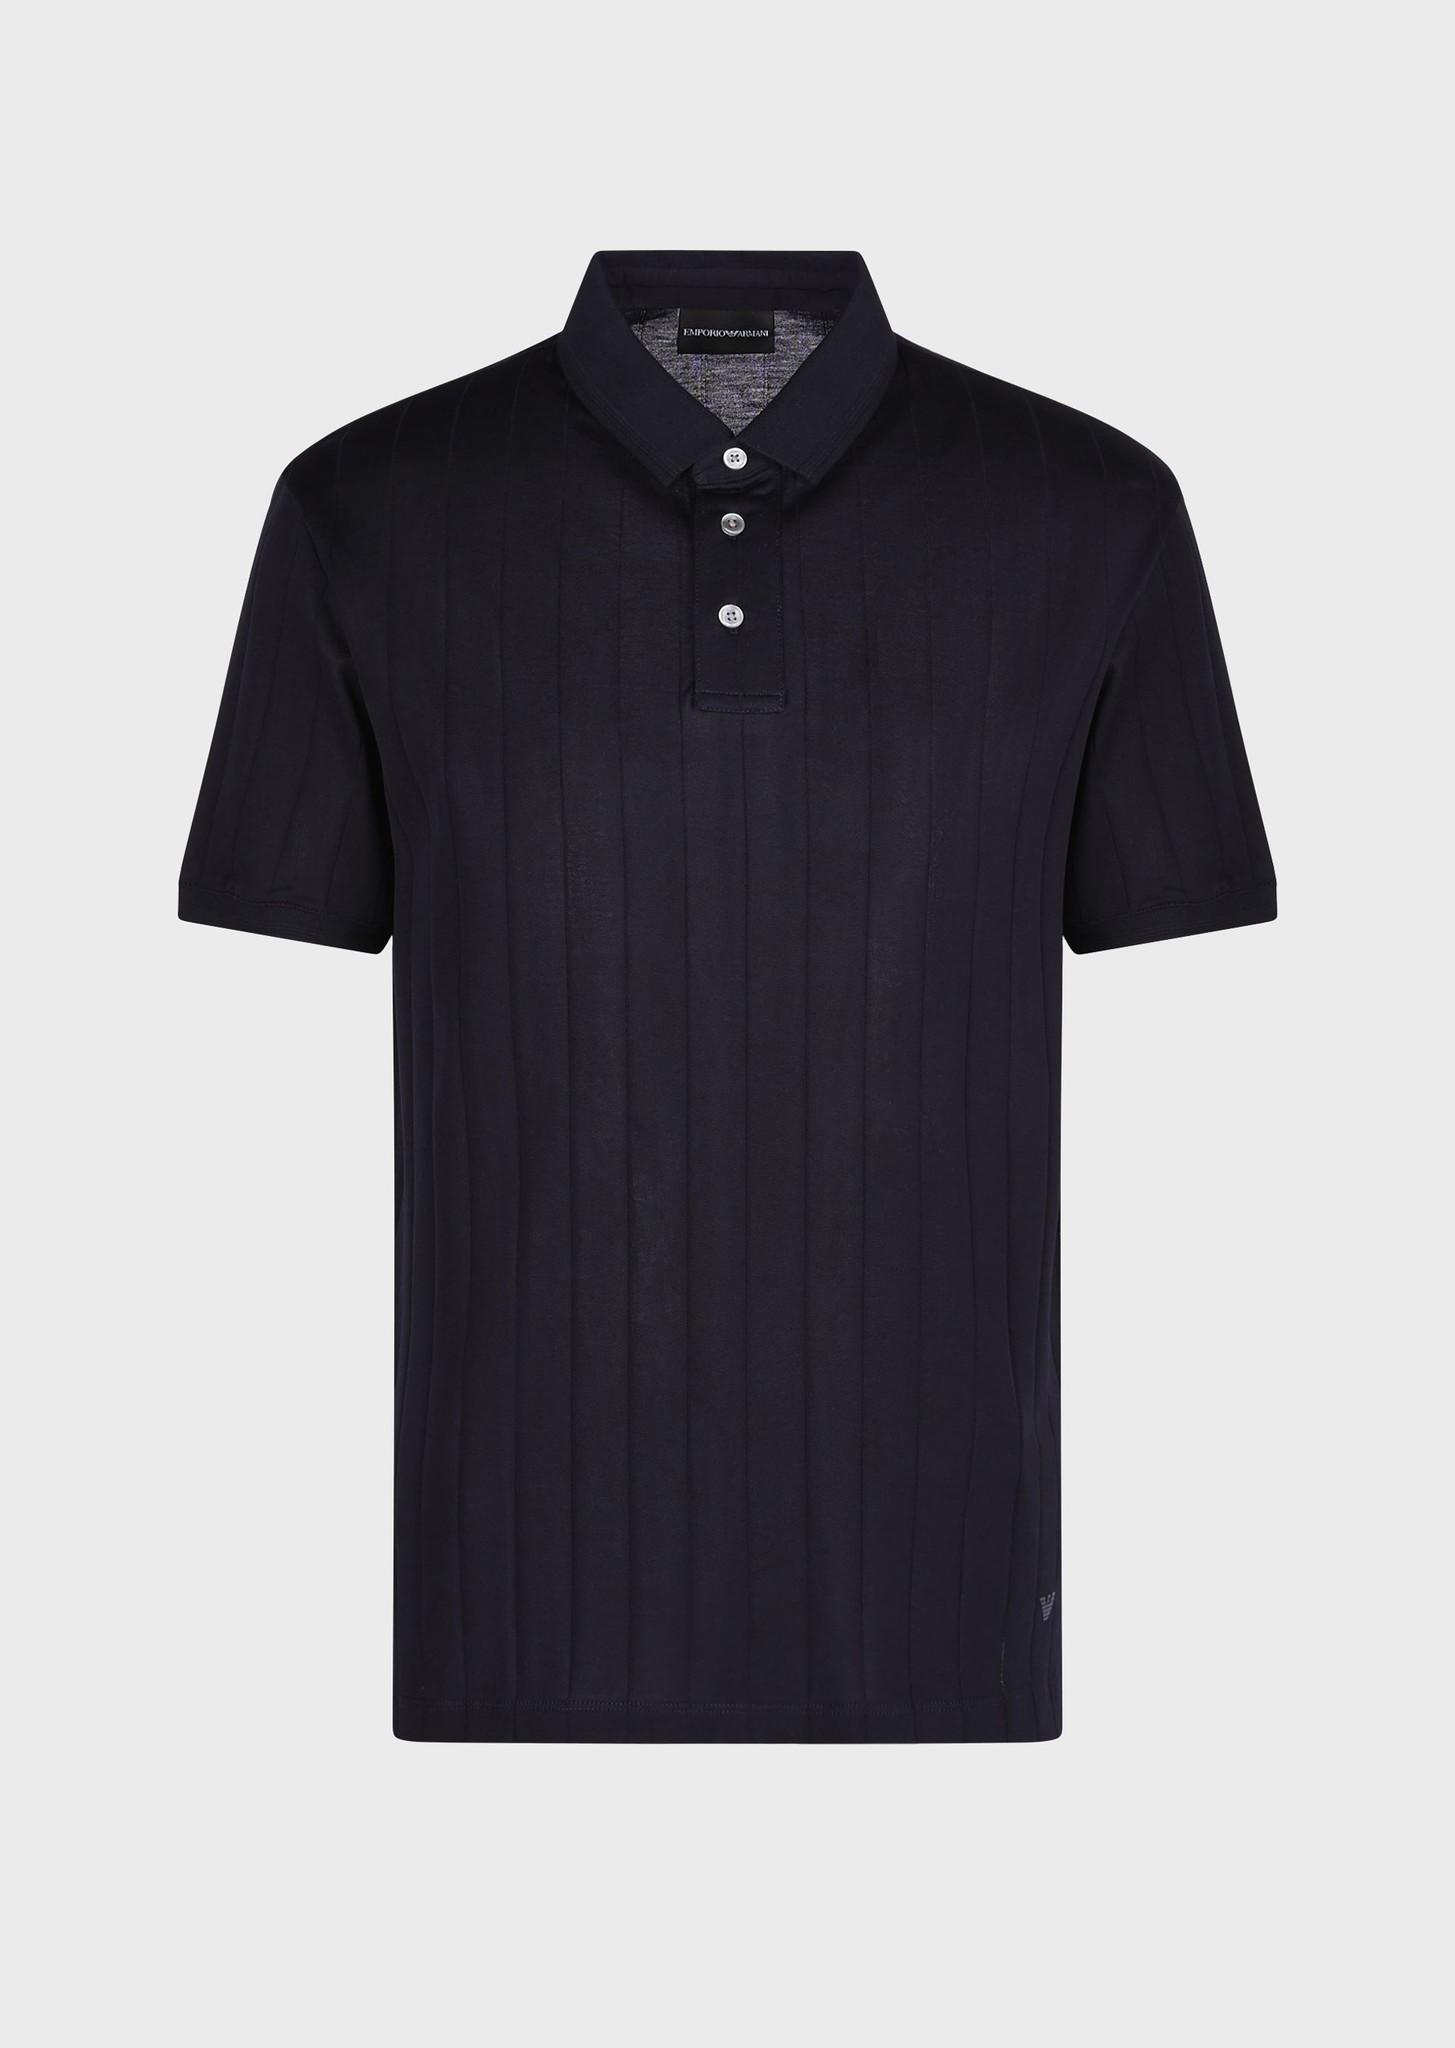 Jacquard Jersey Polo-1